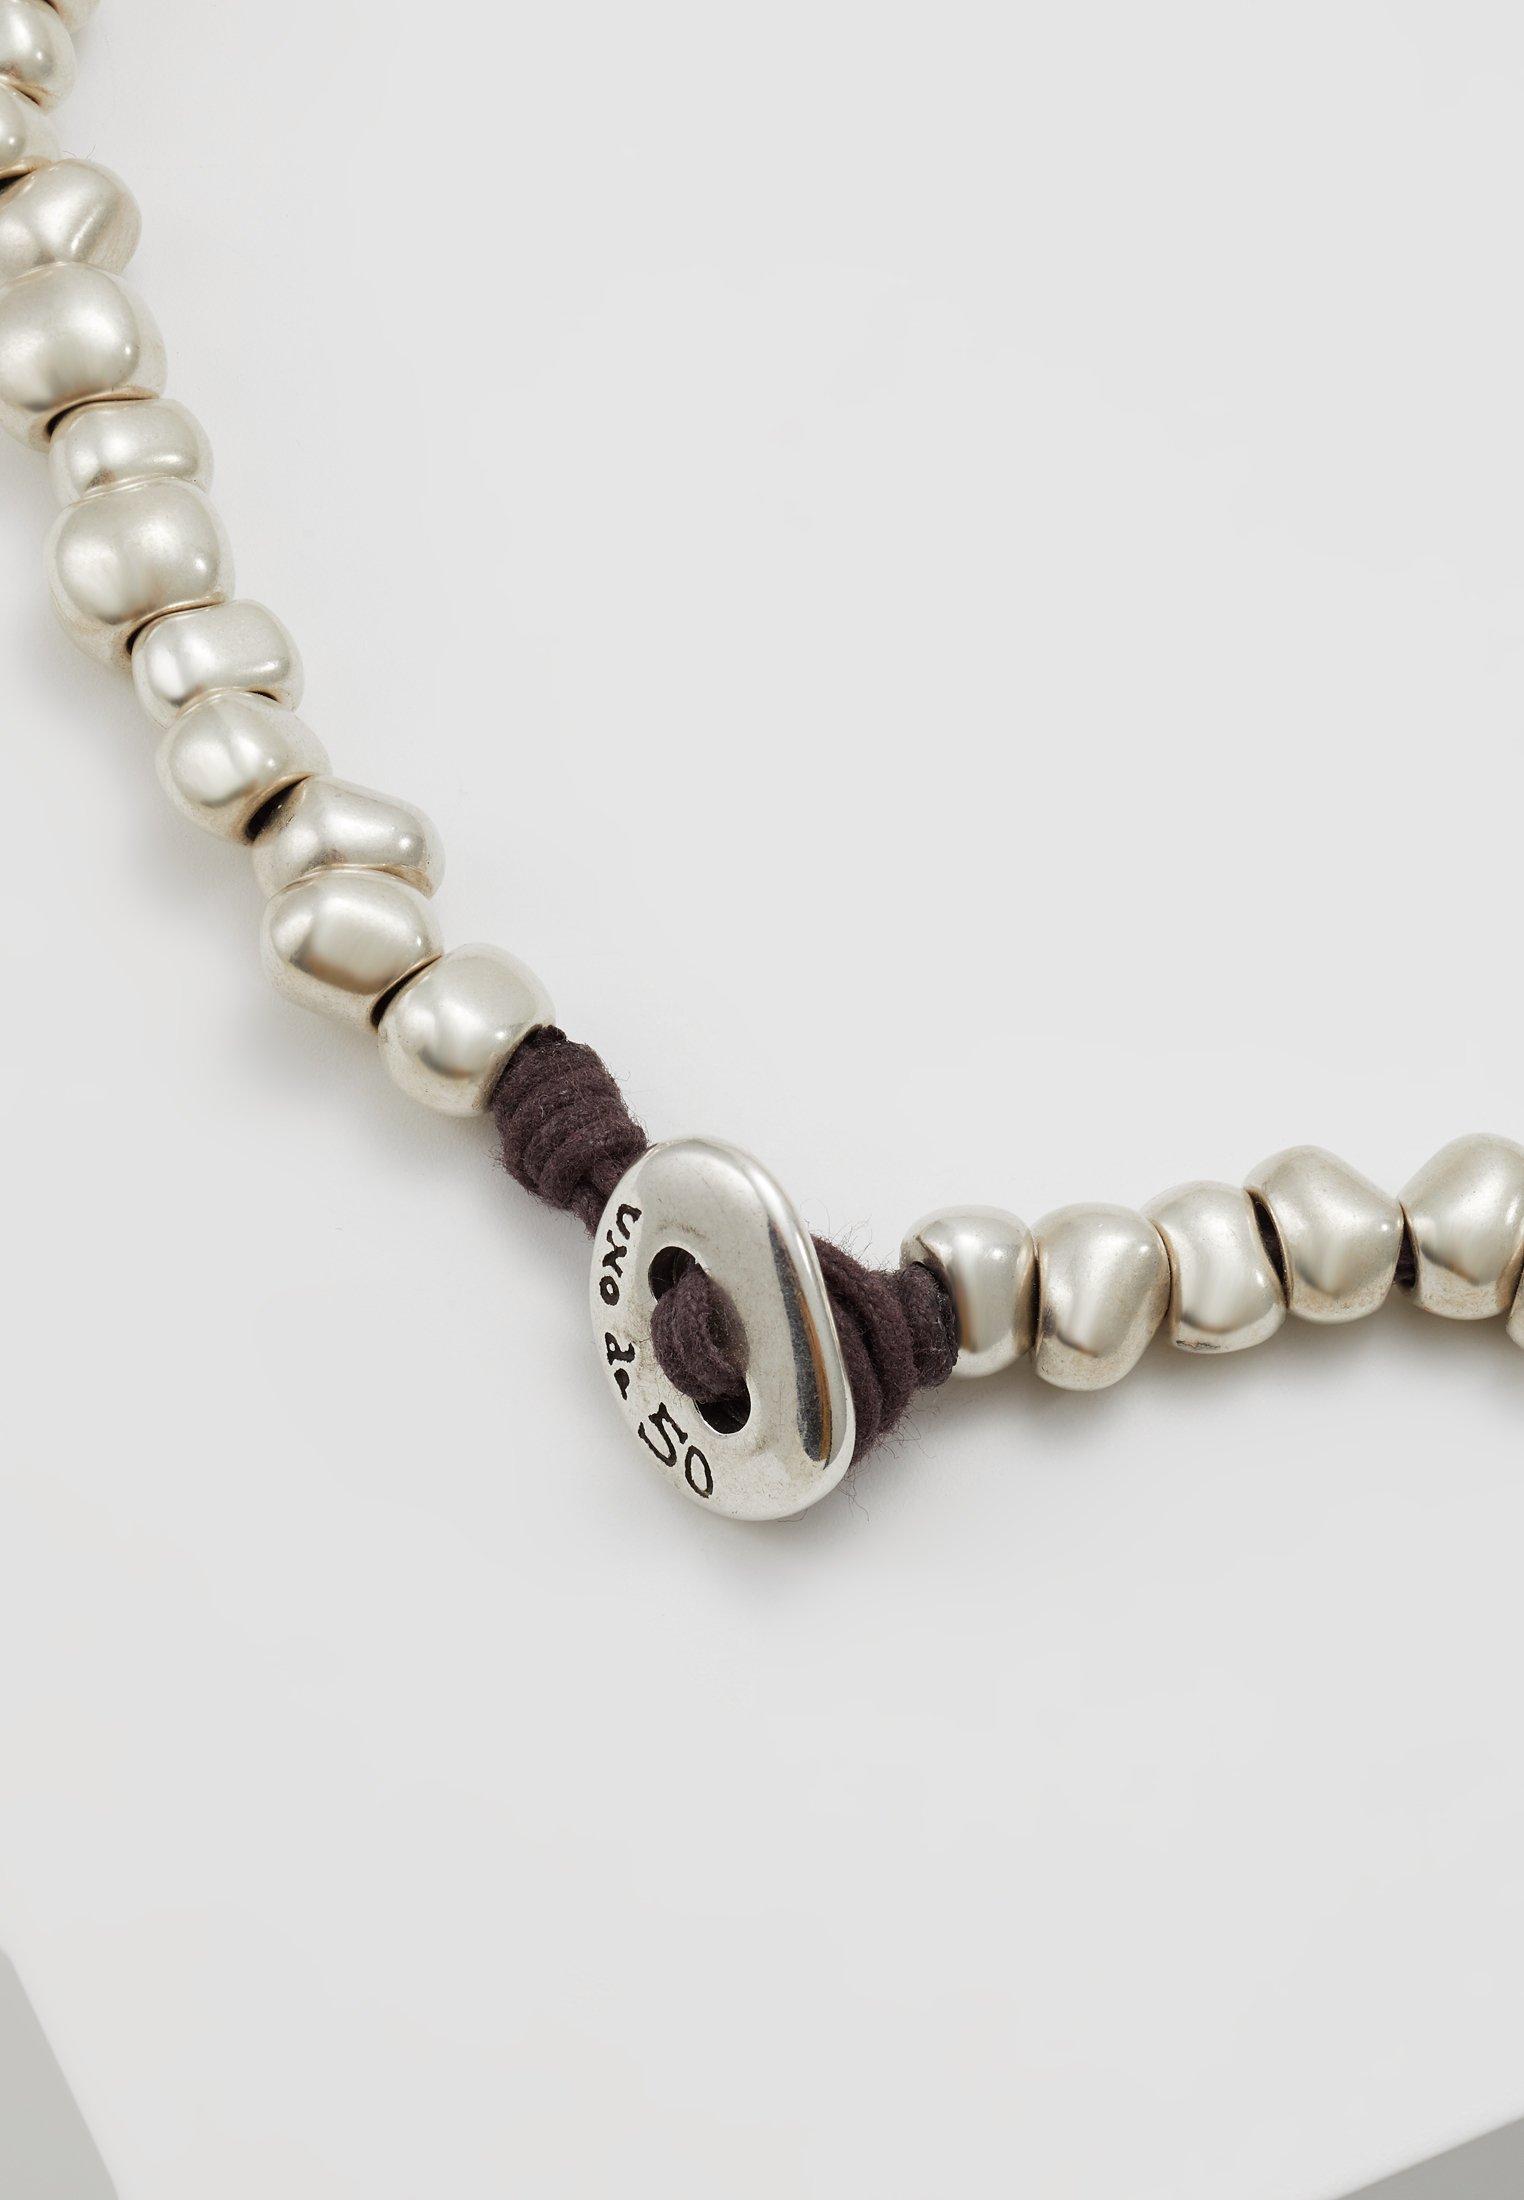 coloured Unode50 HeartfeltCollier HeartfeltCollier Silver Silver coloured Unode50 jAq435RL